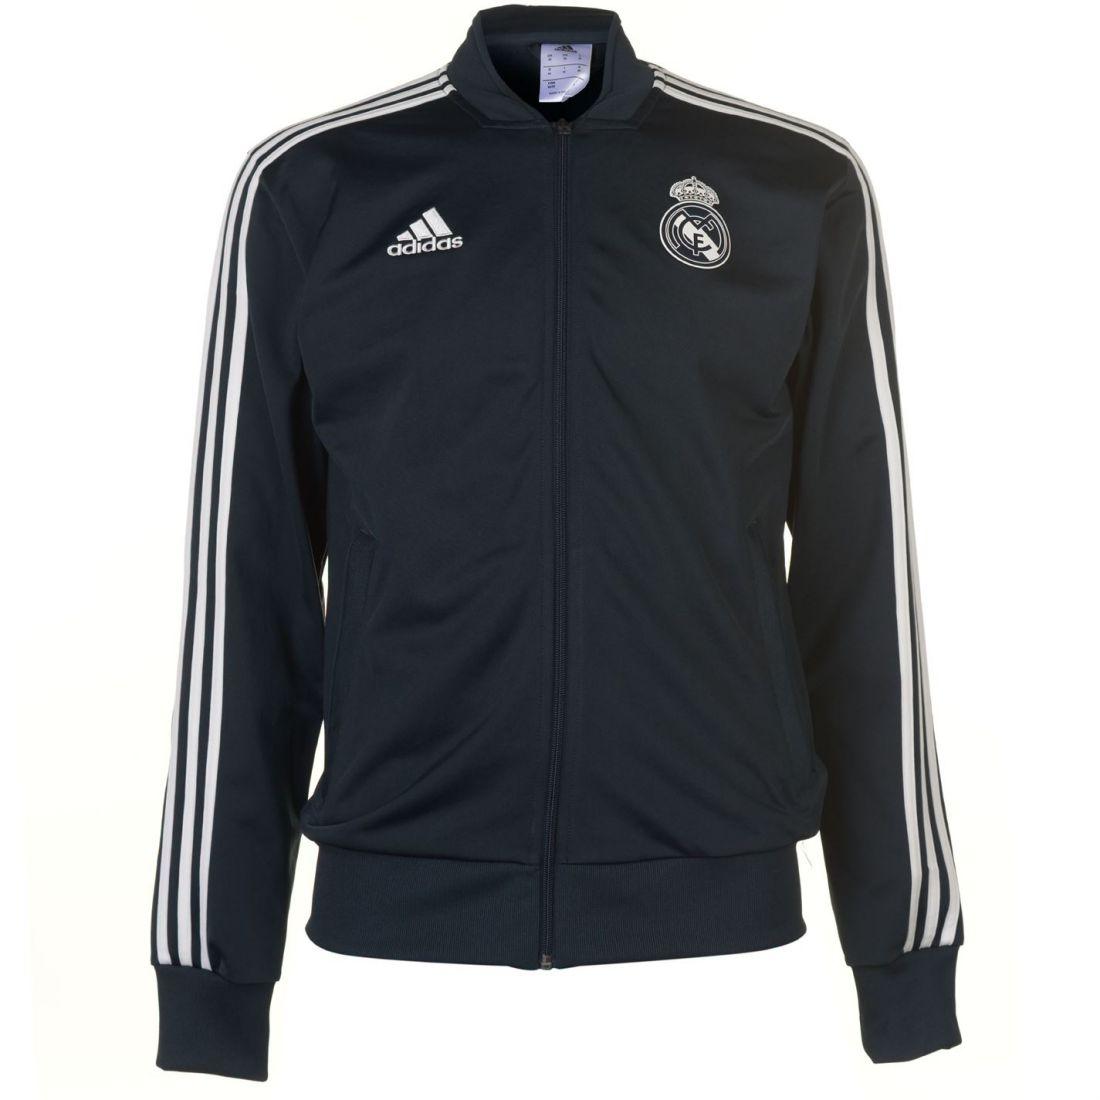 ab25b3f3a17 adidas Real Madrid CF Presentation Jacket Mens Gents Tracksuit Top ...